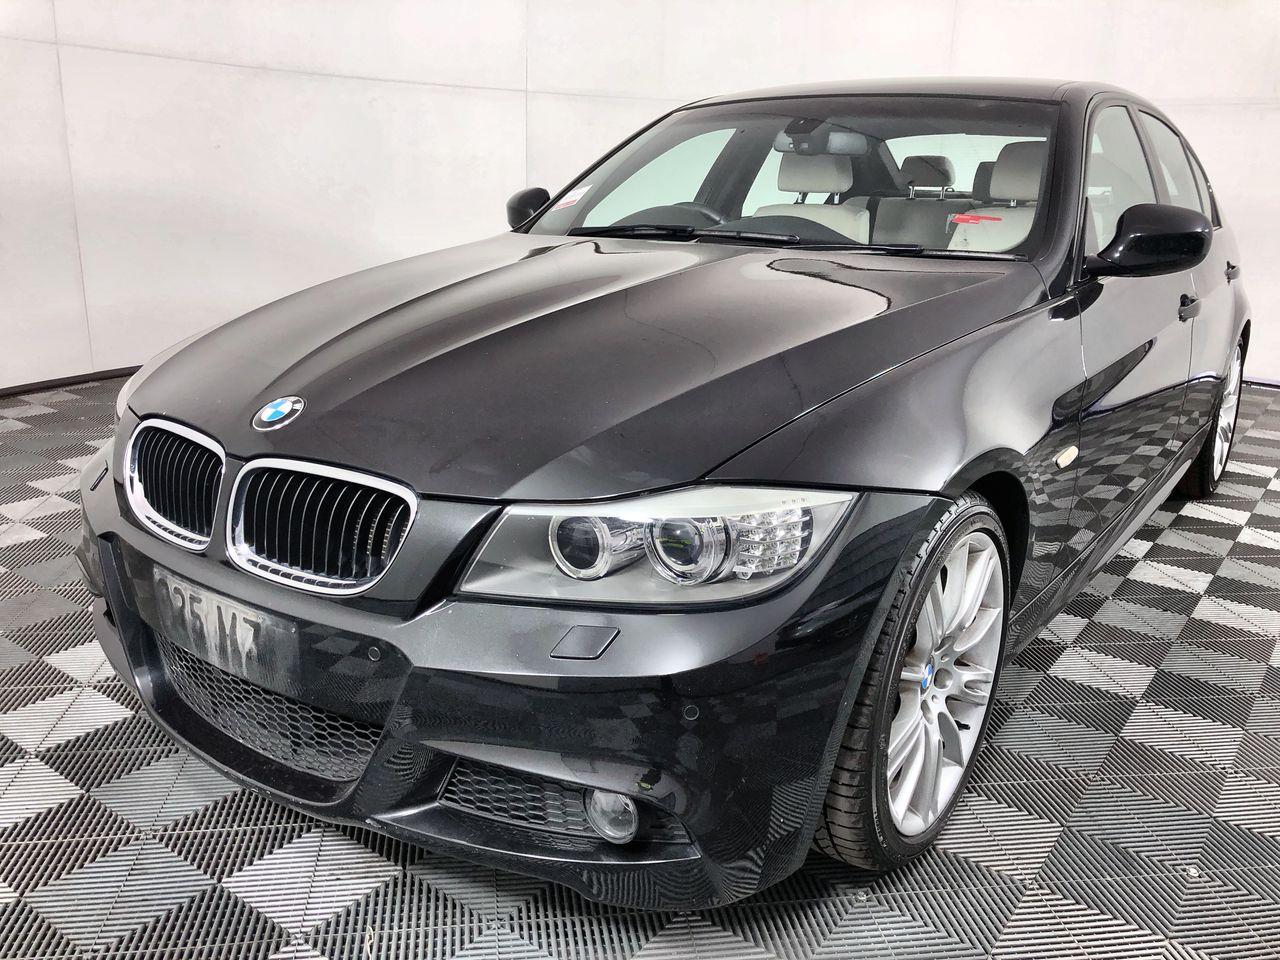 2010 BMW 320i Sedan 4cylinder Auto, 124,006kms (log books)